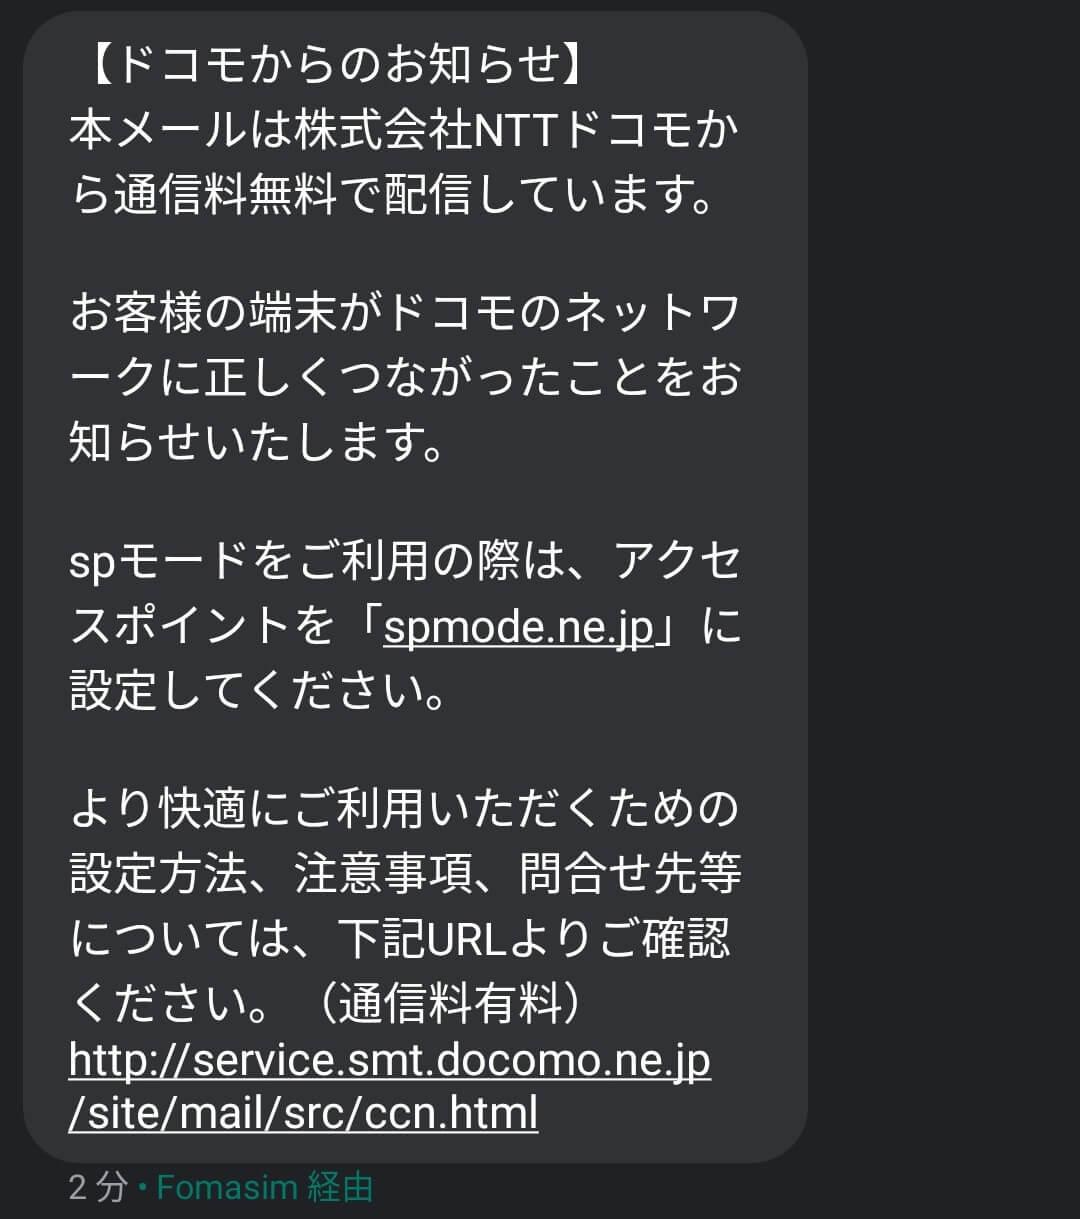 Oneplus 8T fomasim開通確認SMS